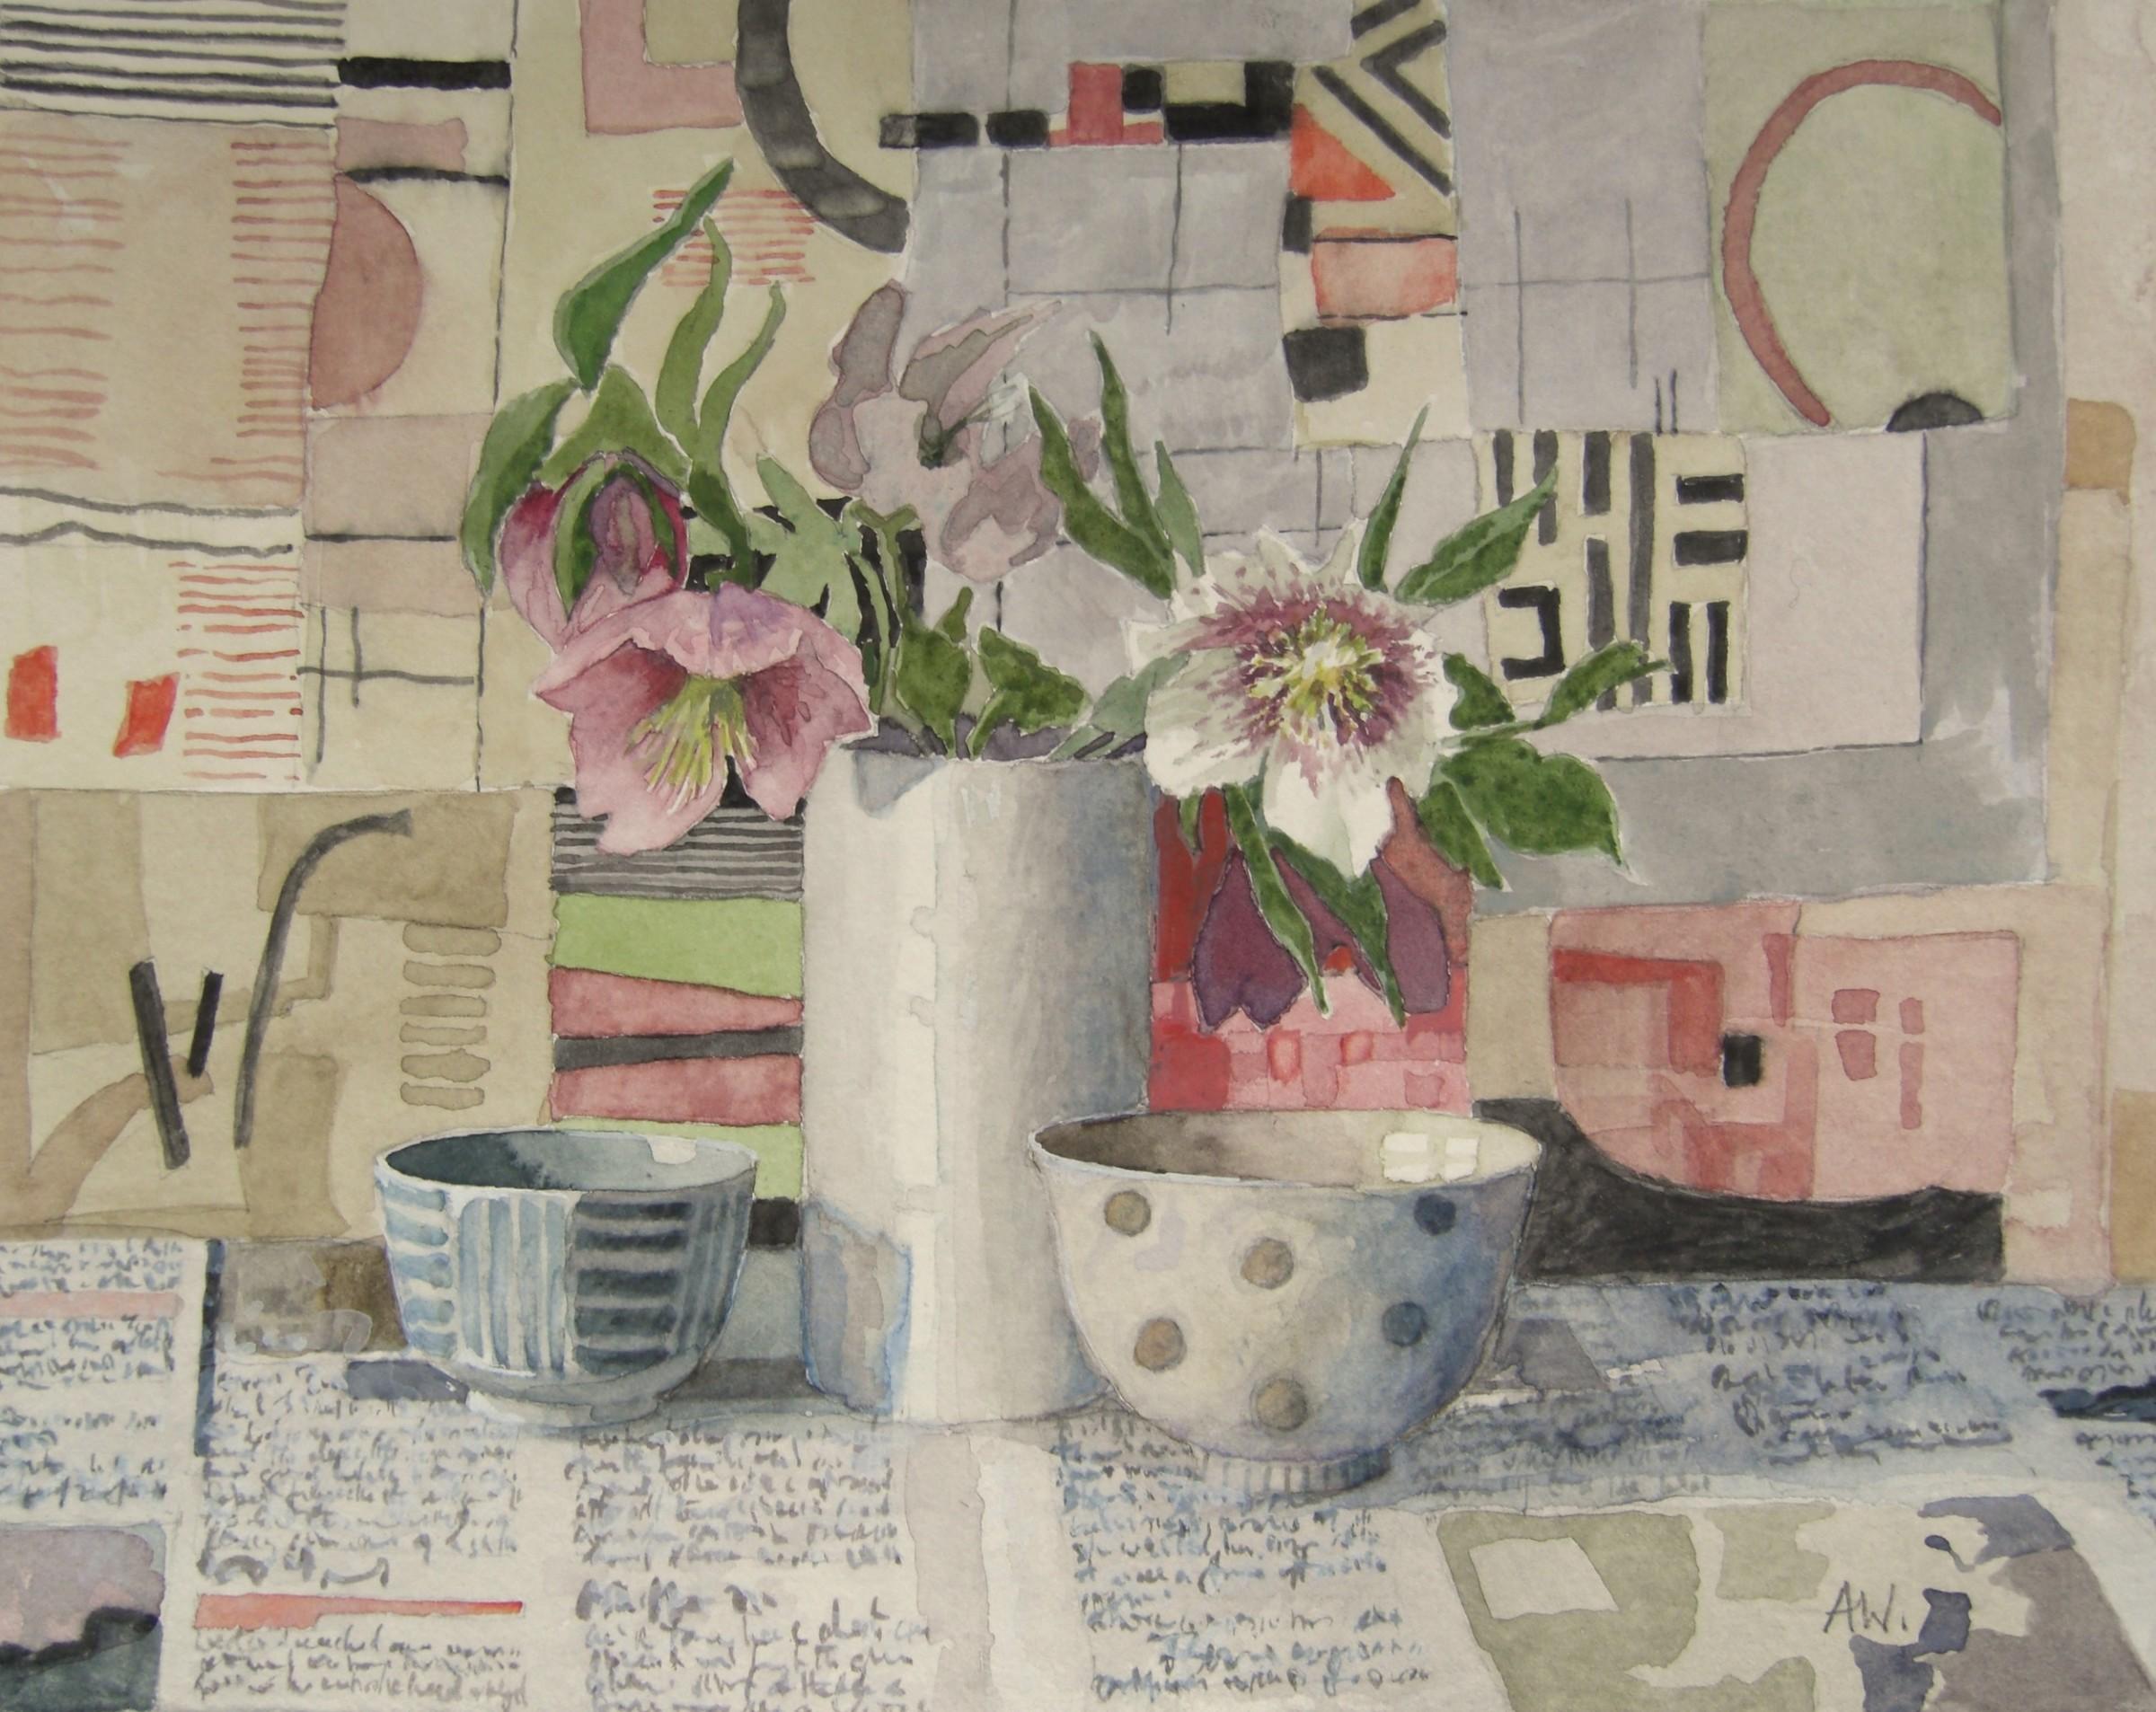 "<span class=""link fancybox-details-link""><a href=""/artists/109-annie-williams/works/12326-annie-williams-last-of-the-hellebores/"">View Detail Page</a></span><div class=""artist""><span class=""artist""><strong>Annie Williams</strong></span></div><div class=""title""><em>Last of the Hellebores</em></div><div class=""medium"">watercolour</div><div class=""dimensions"">Frame: 37 x 41 cm<br /> Artwork: 18 x 24 cm</div><div class=""price"">£320.00</div>"